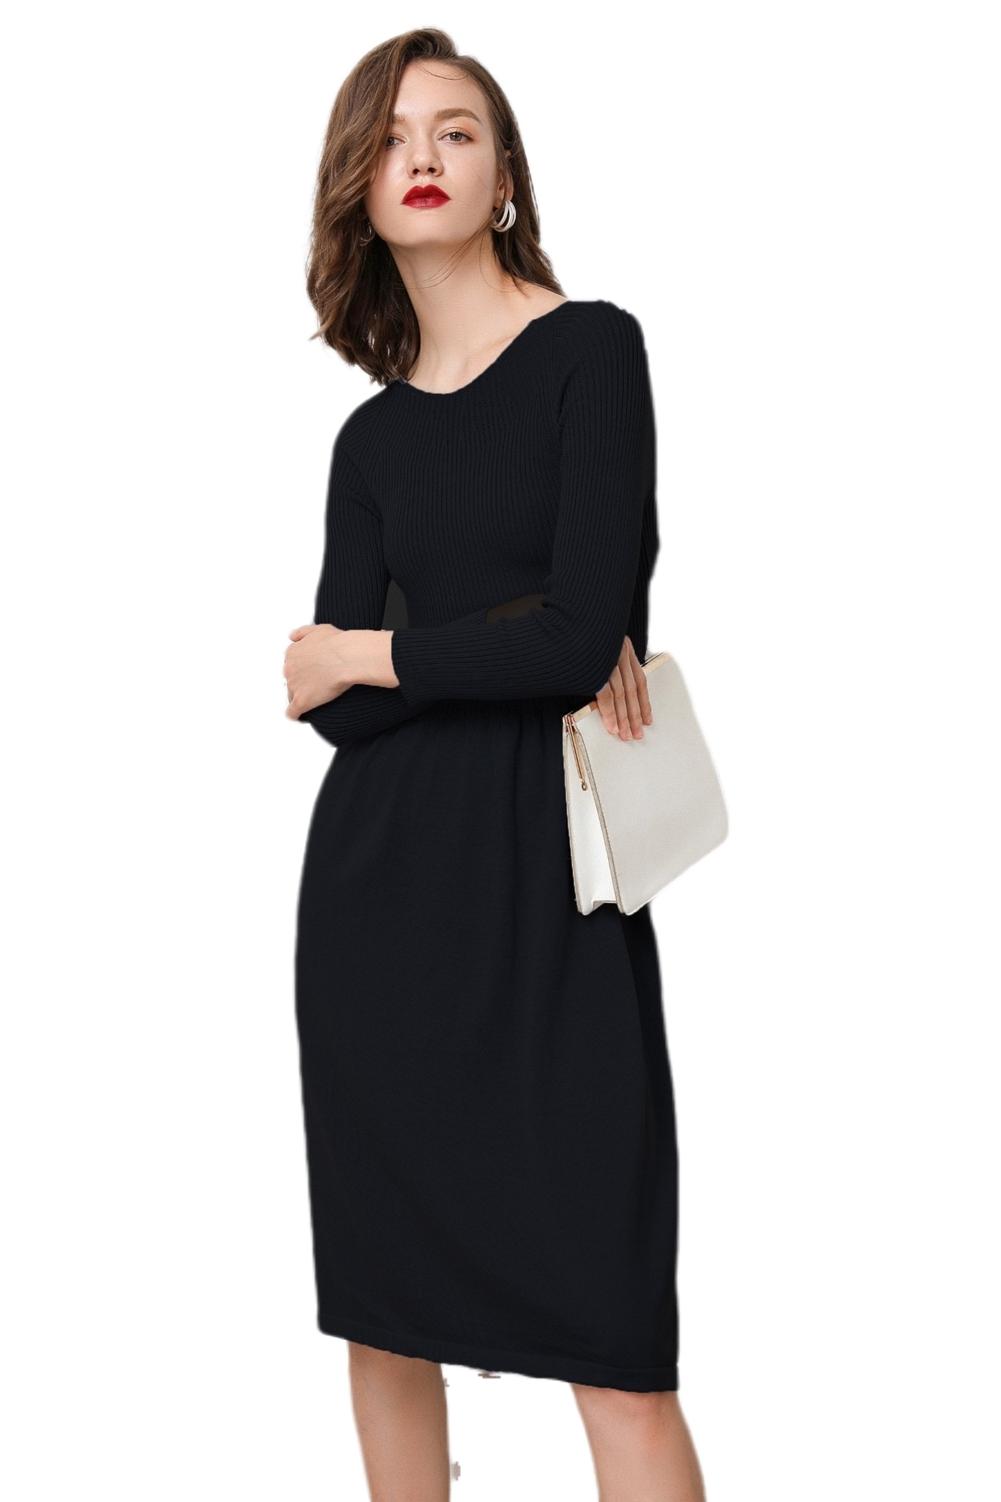 RanRui Knit Dress Fall&Winter Dresses Women's Cashmere Boat Neck Ribbed Elbow fi